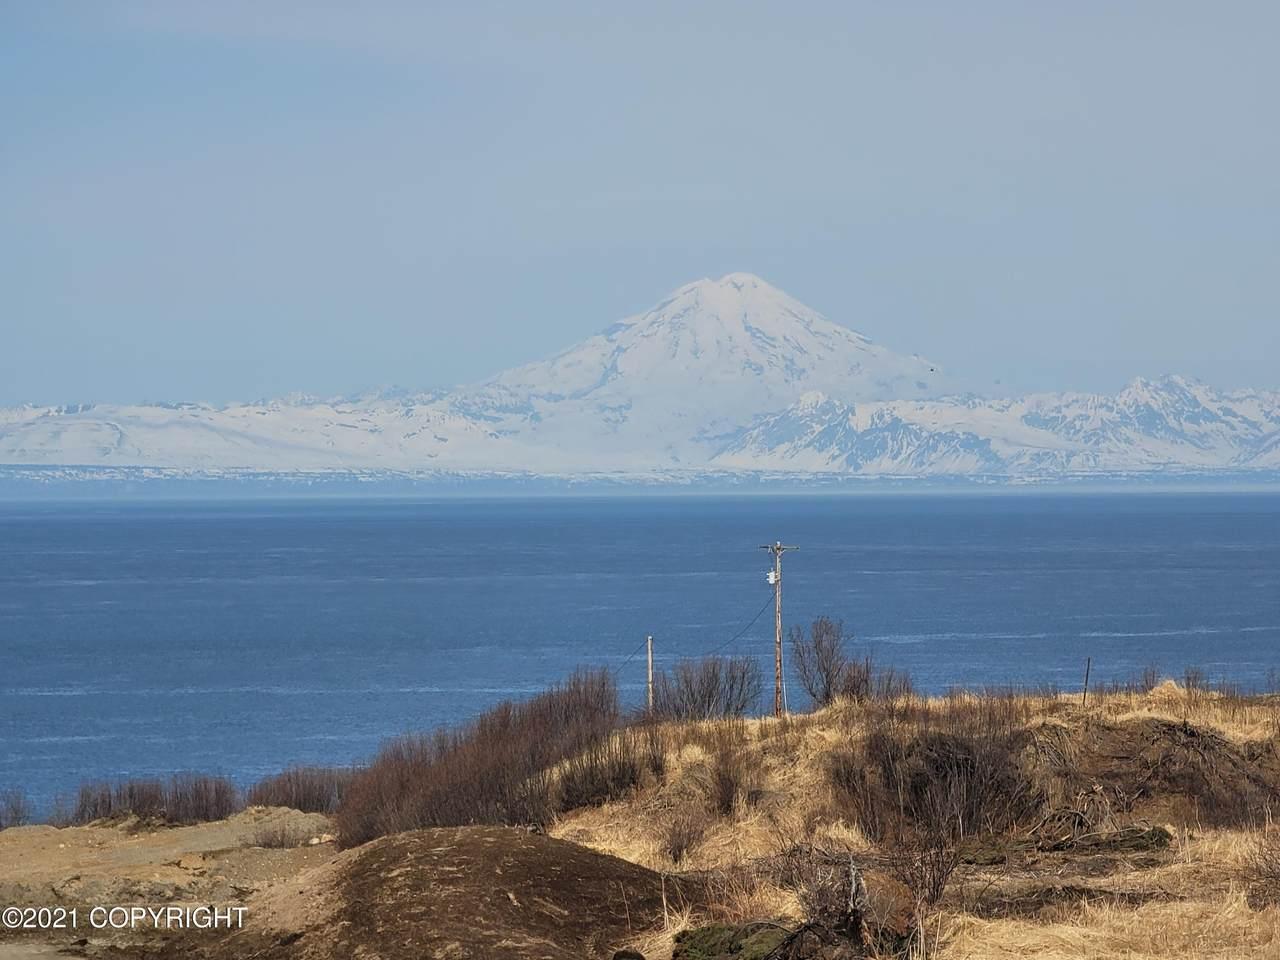 https://bt-photos.global.ssl.fastly.net/alaska/1280_boomver_2_21-6423-2.jpg